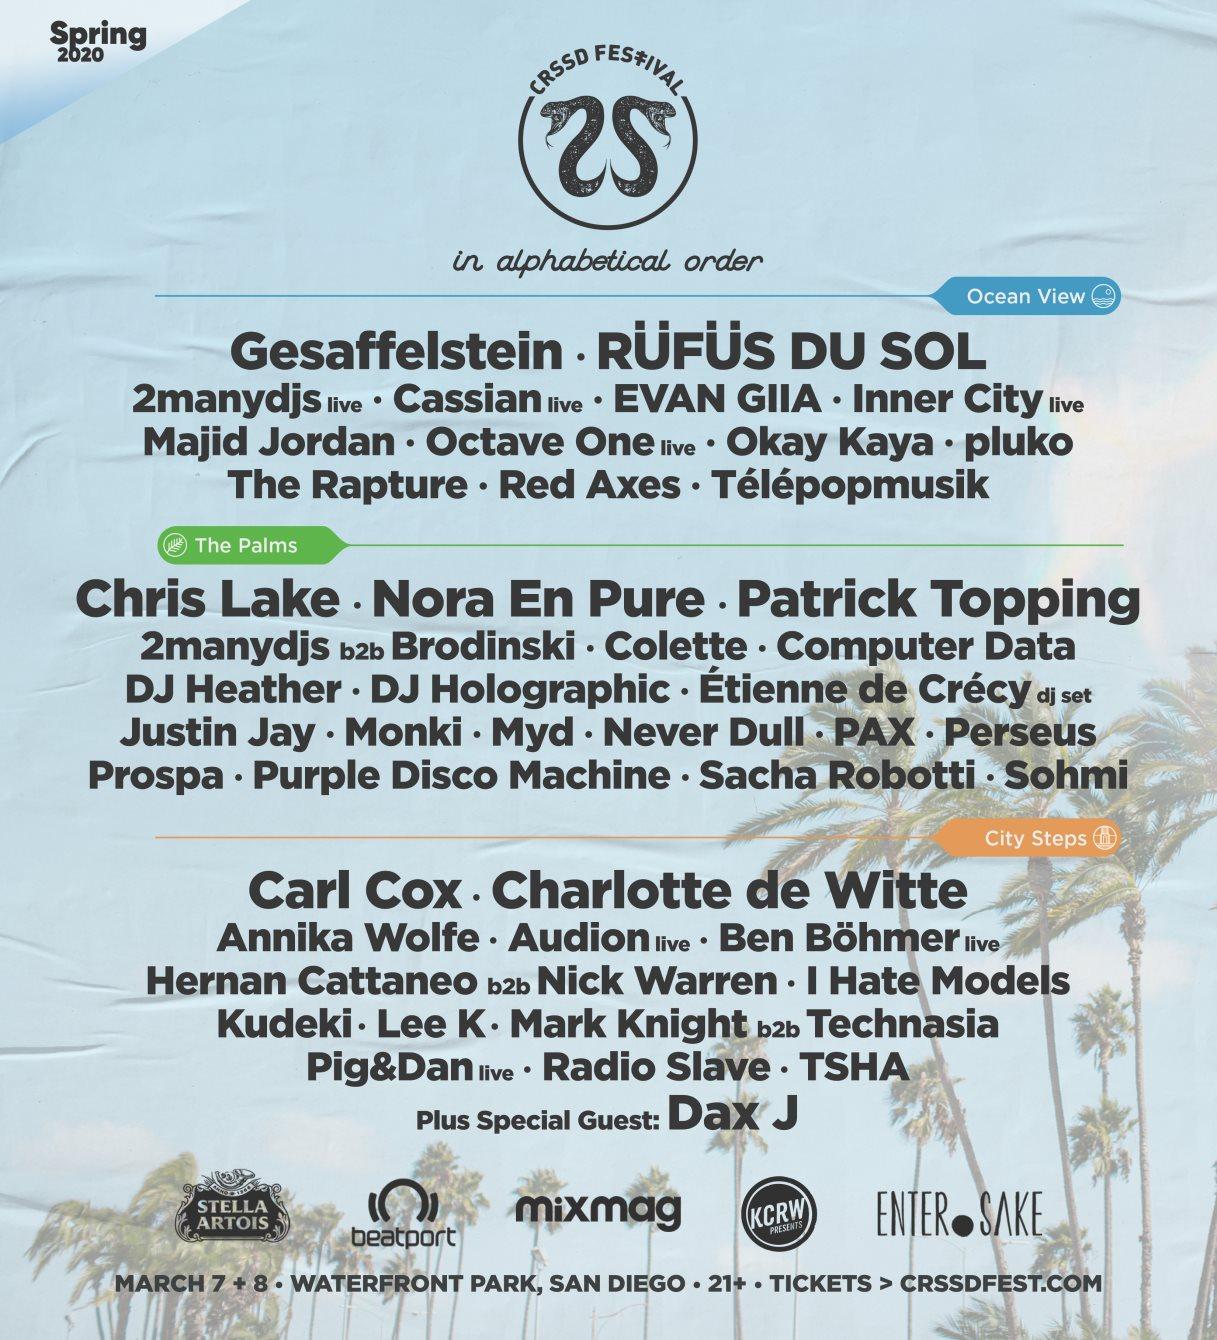 Crssd Festival Spring '20 presented by FNGRS CRSSD - Flyer front